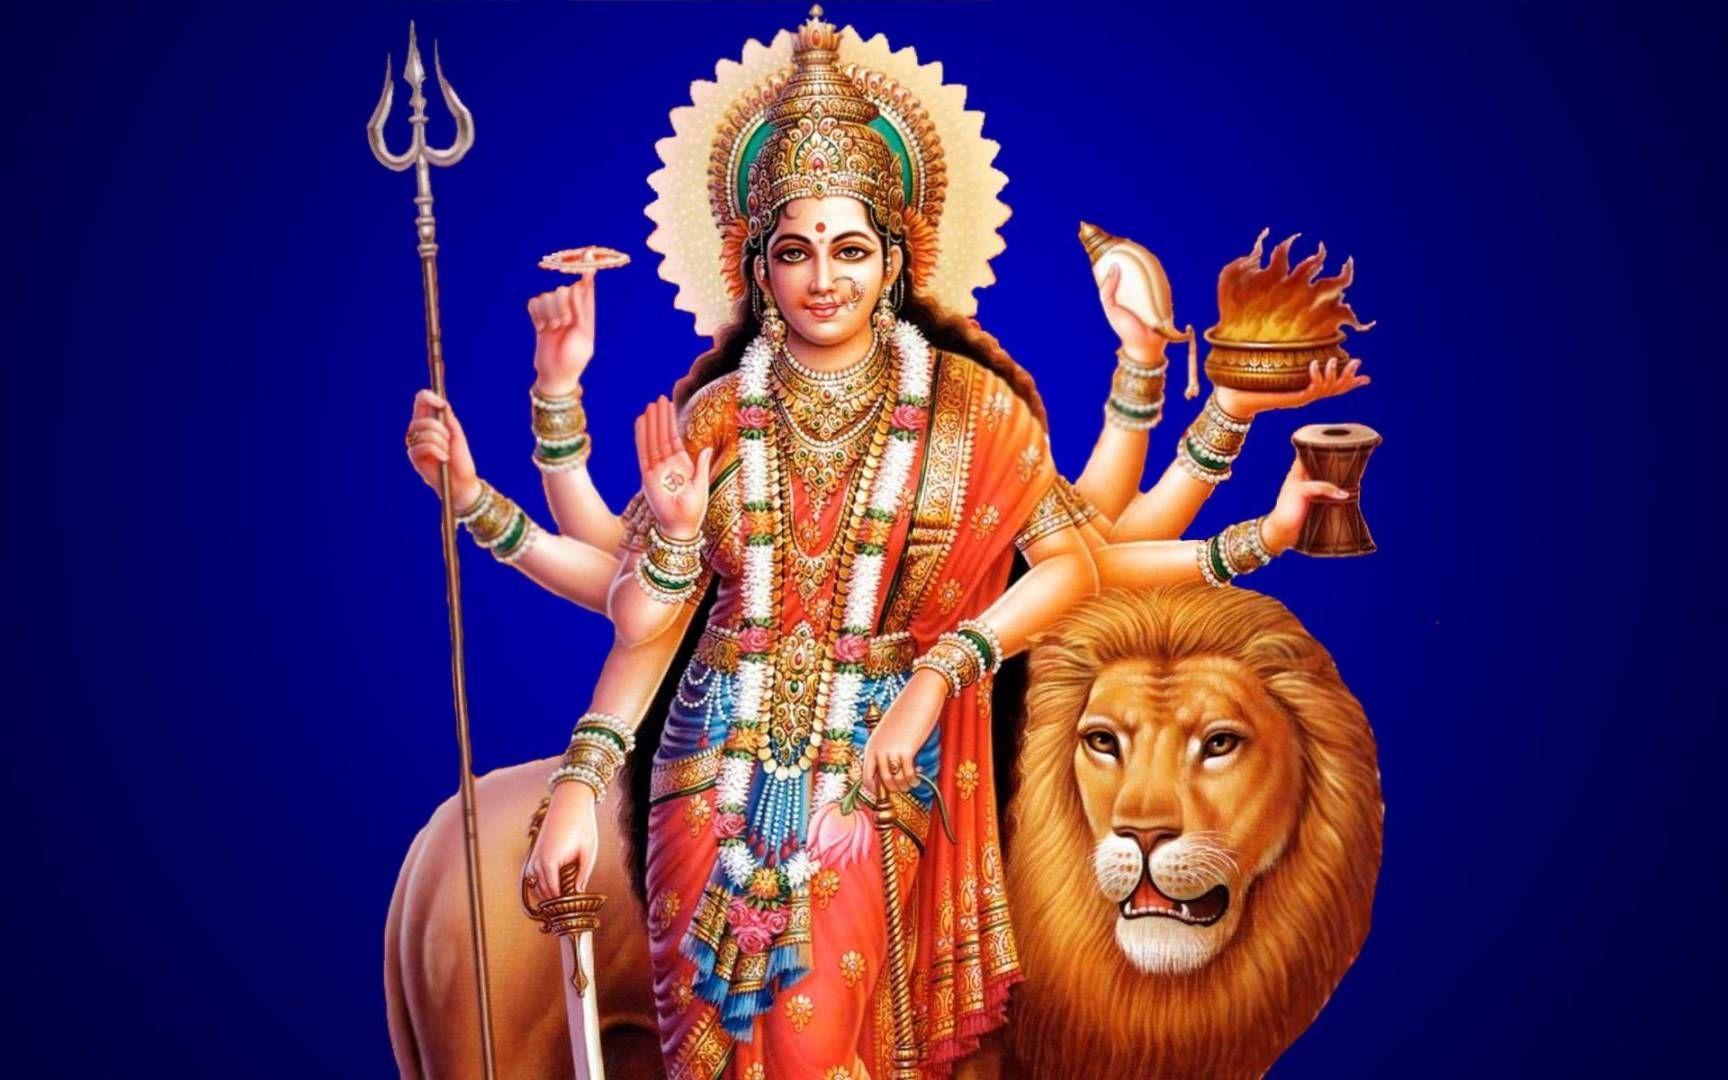 Maa Durga Wallpaper Is A High Resolution Desktop Wallpaper Posted In